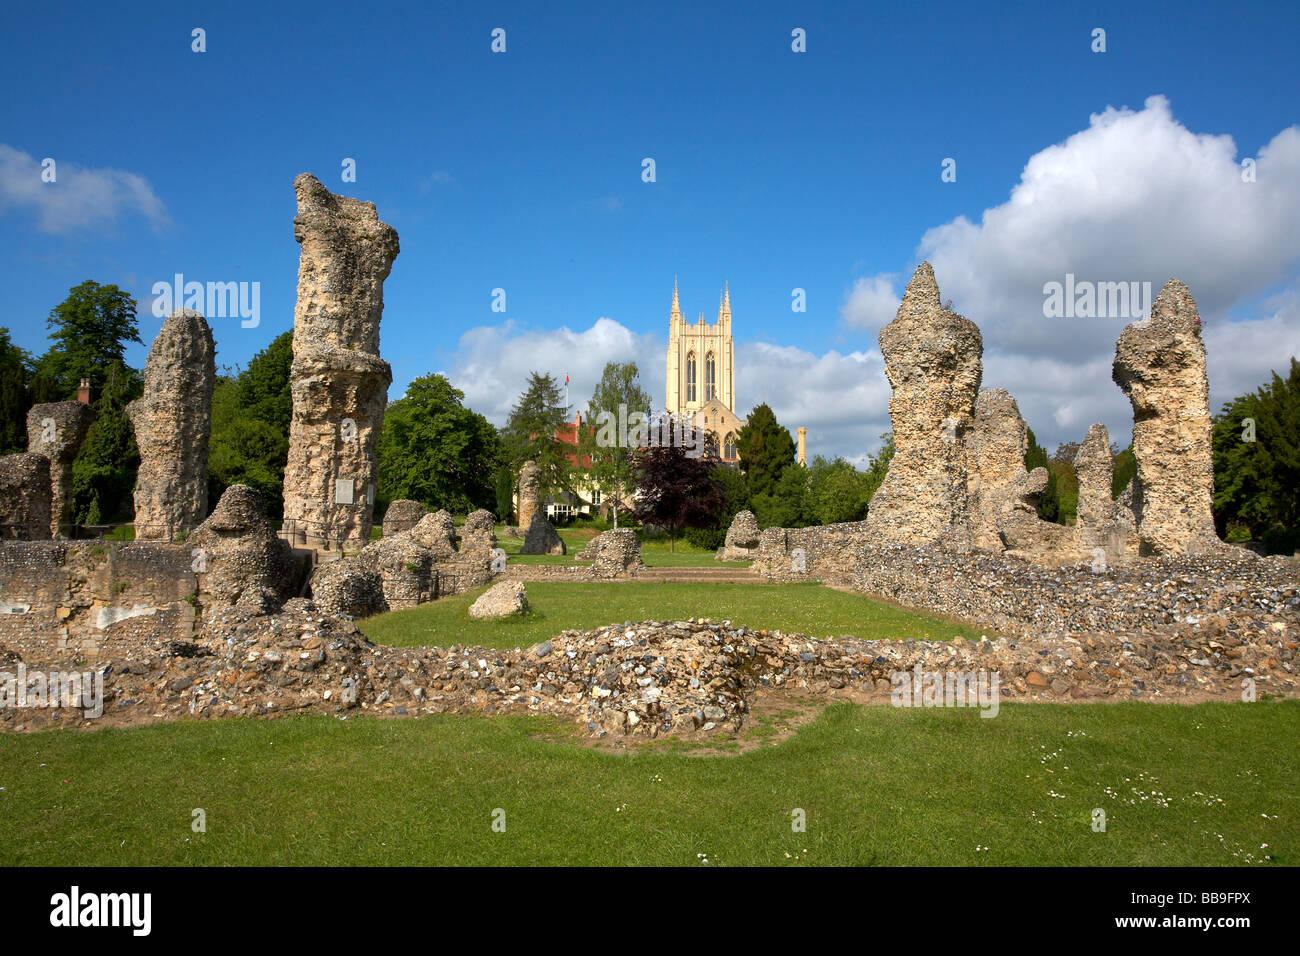 England Suffolk Bury St Edmunds Abbey Gardens St